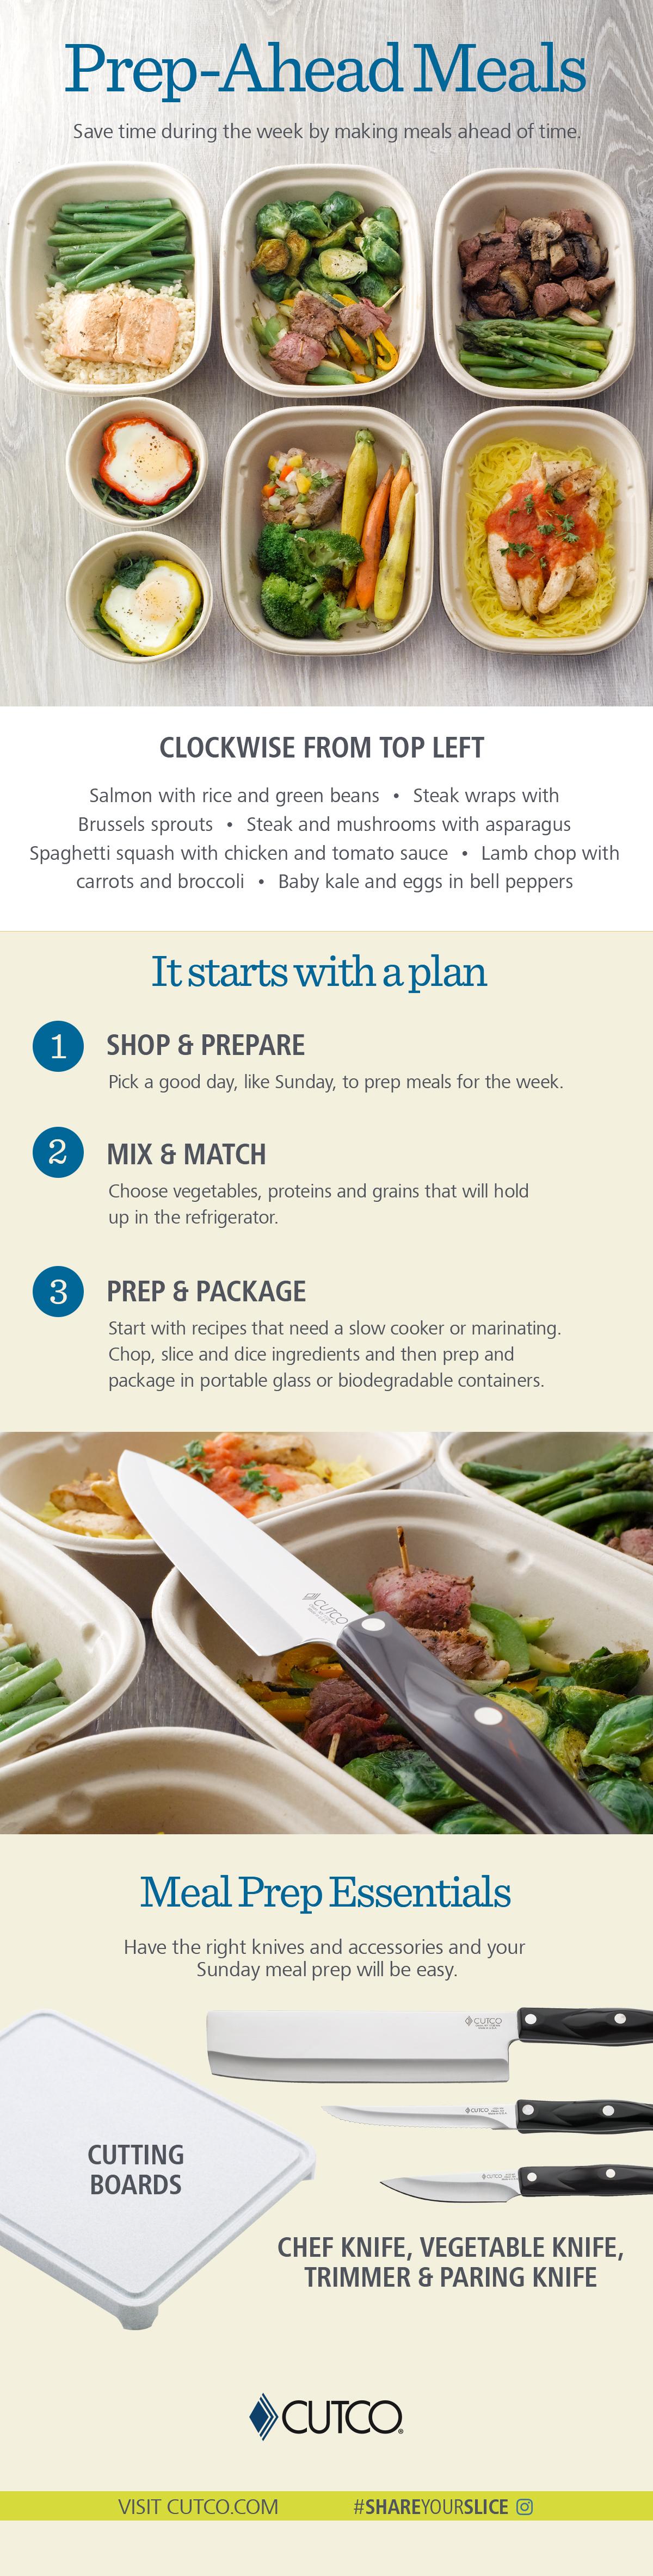 Prep Meals Ahead